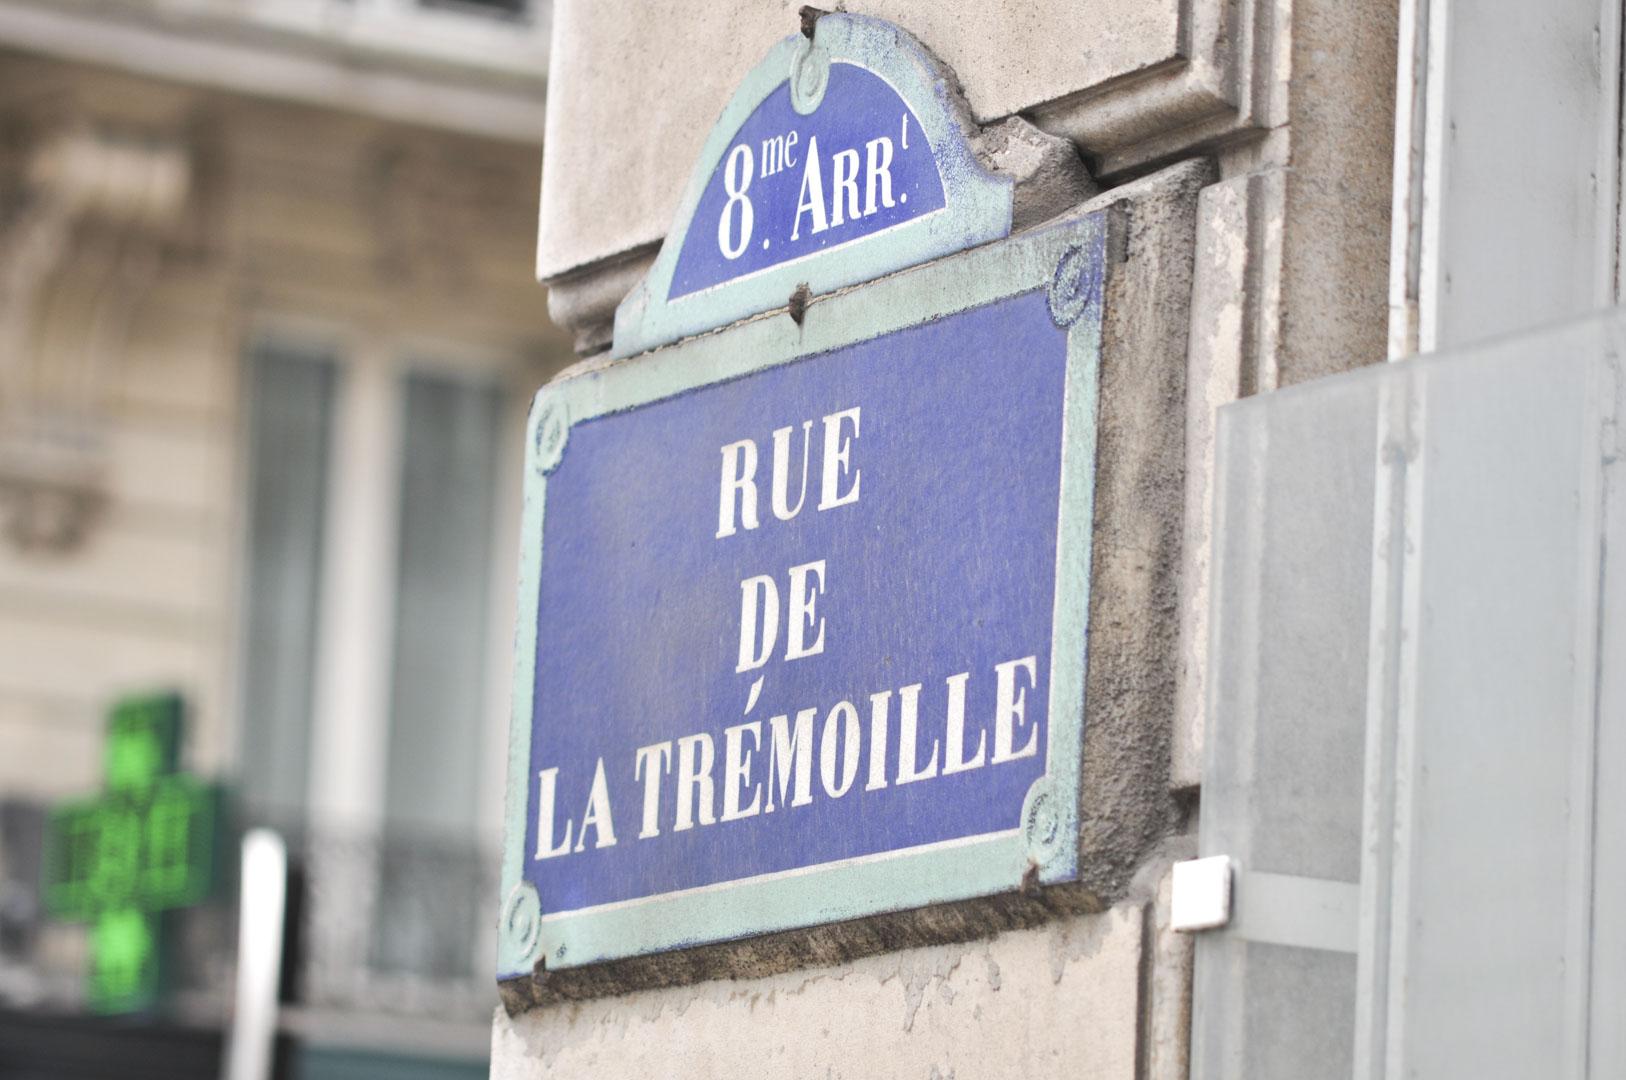 Rue tremoille_1.JPG